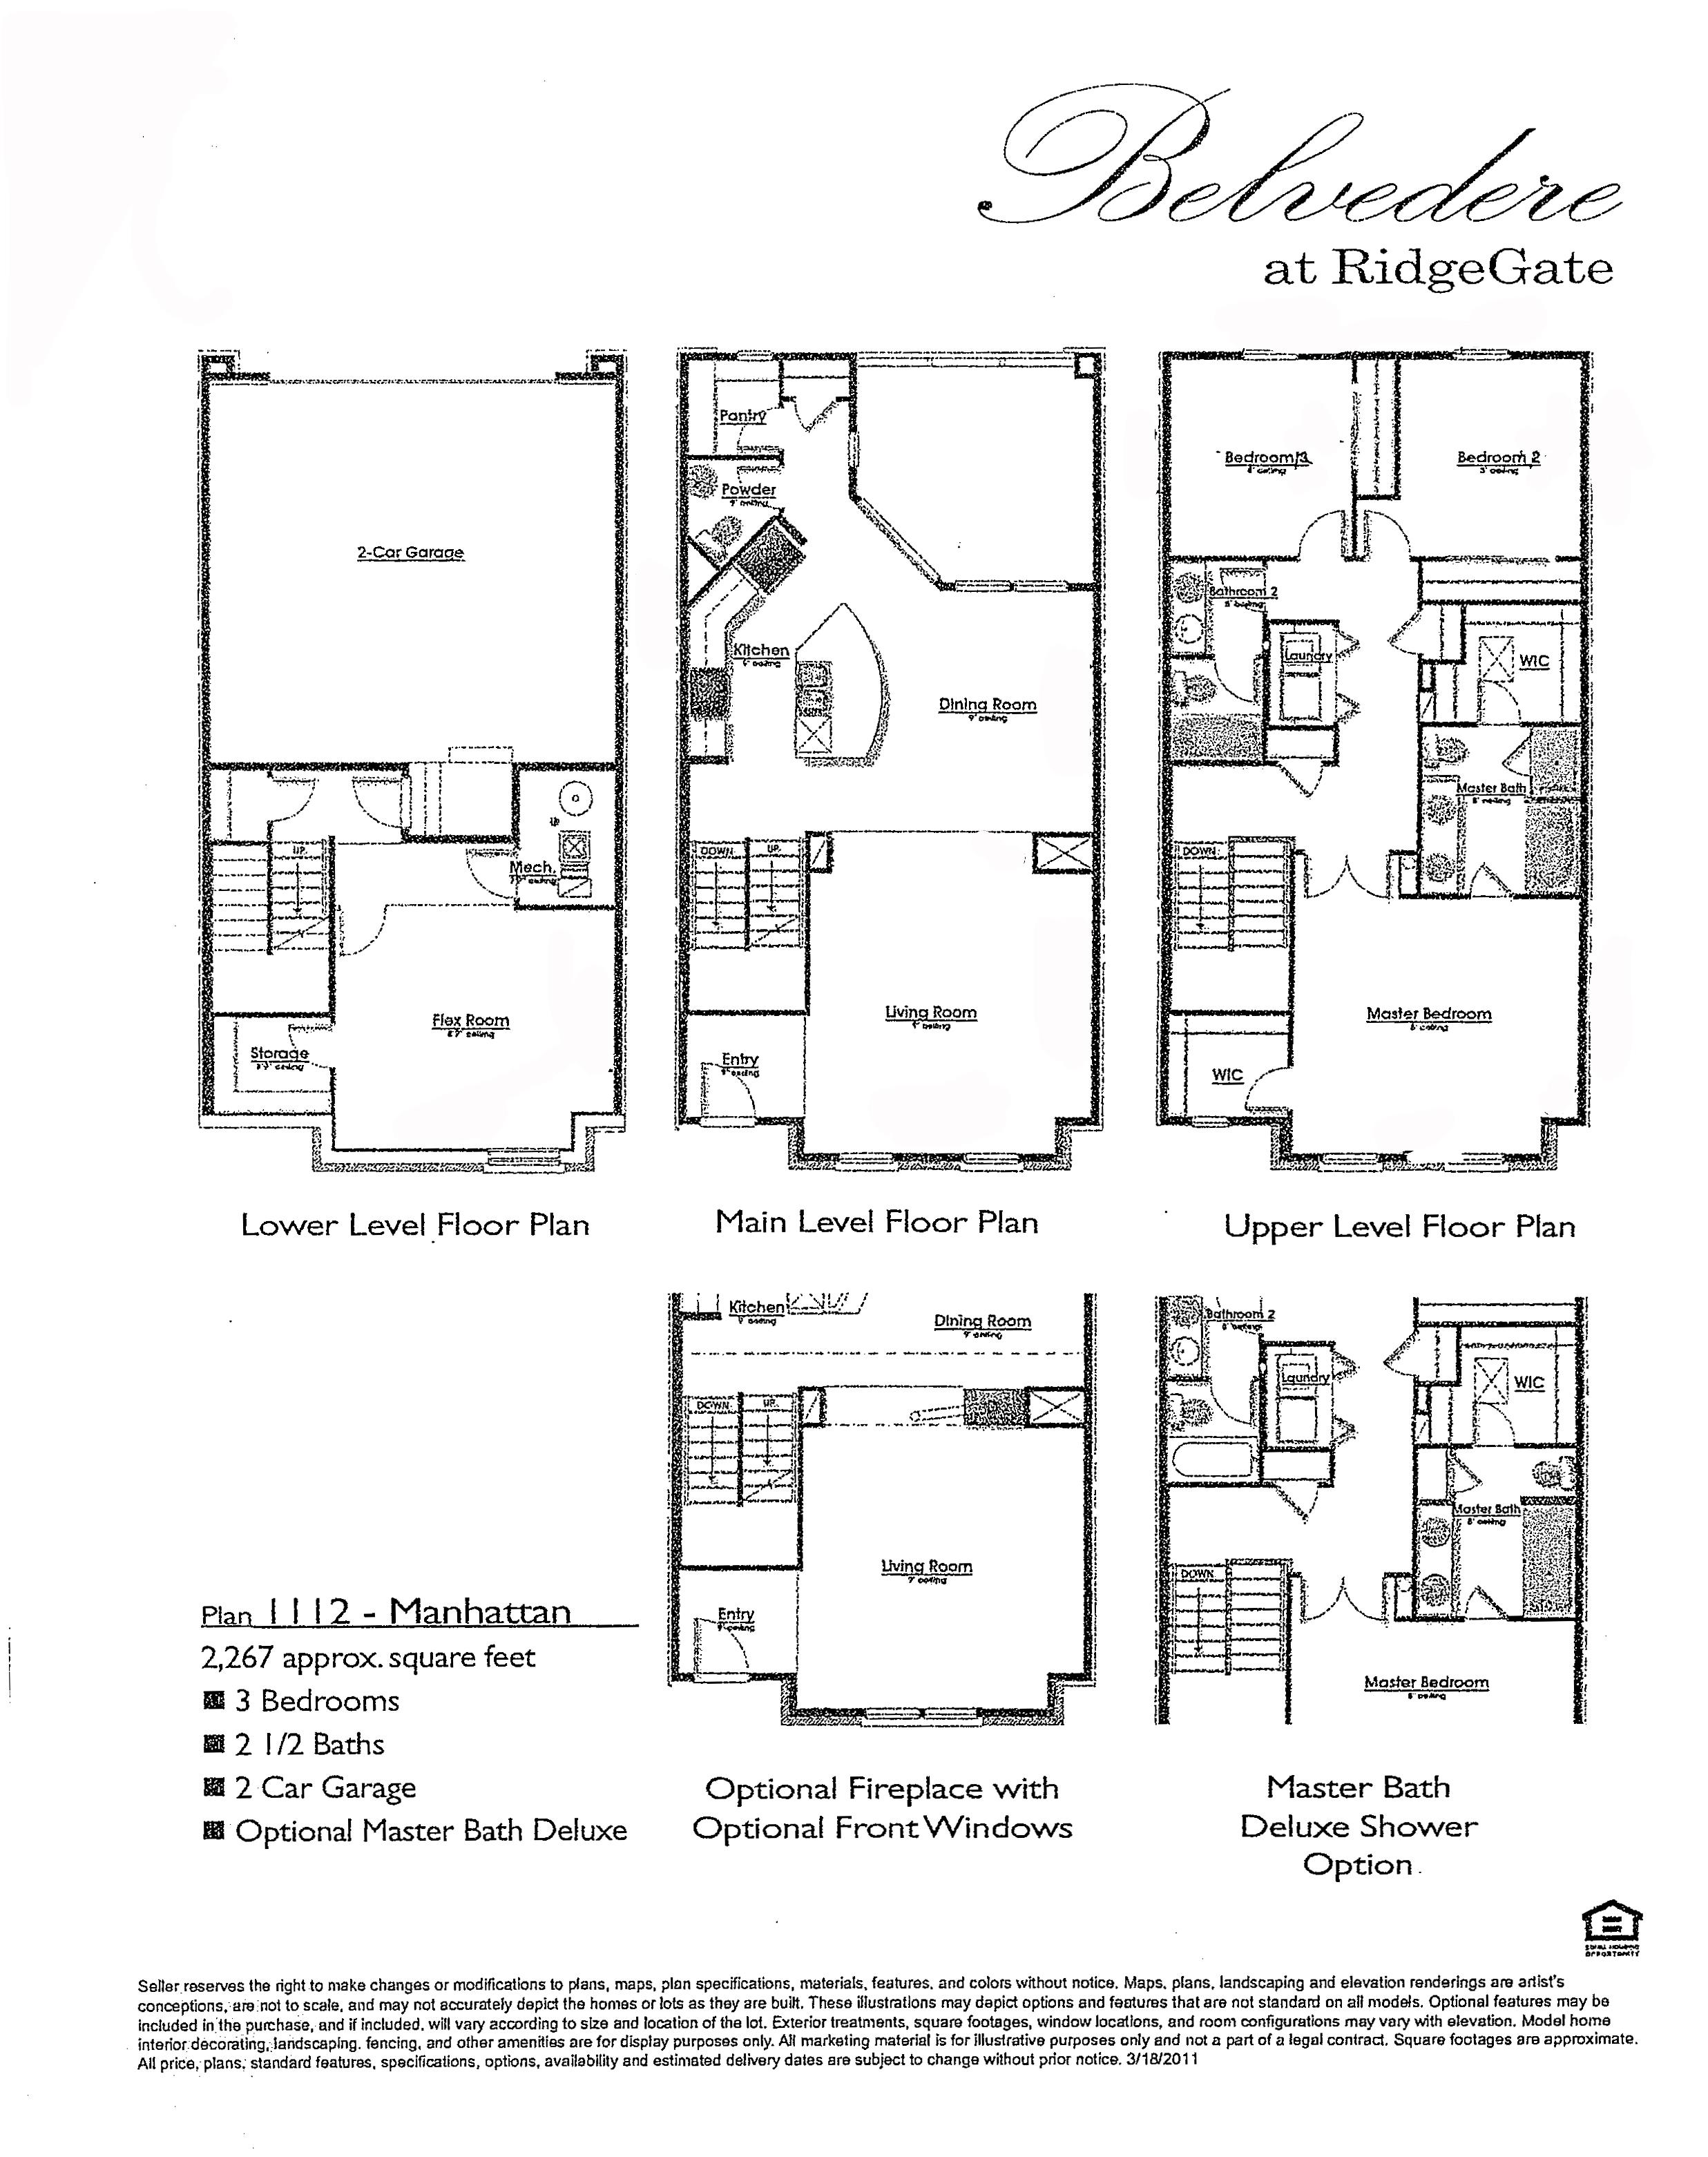 Plan 1112 Manhattan at Belvedere in RidgeGate of Lone Tree CO